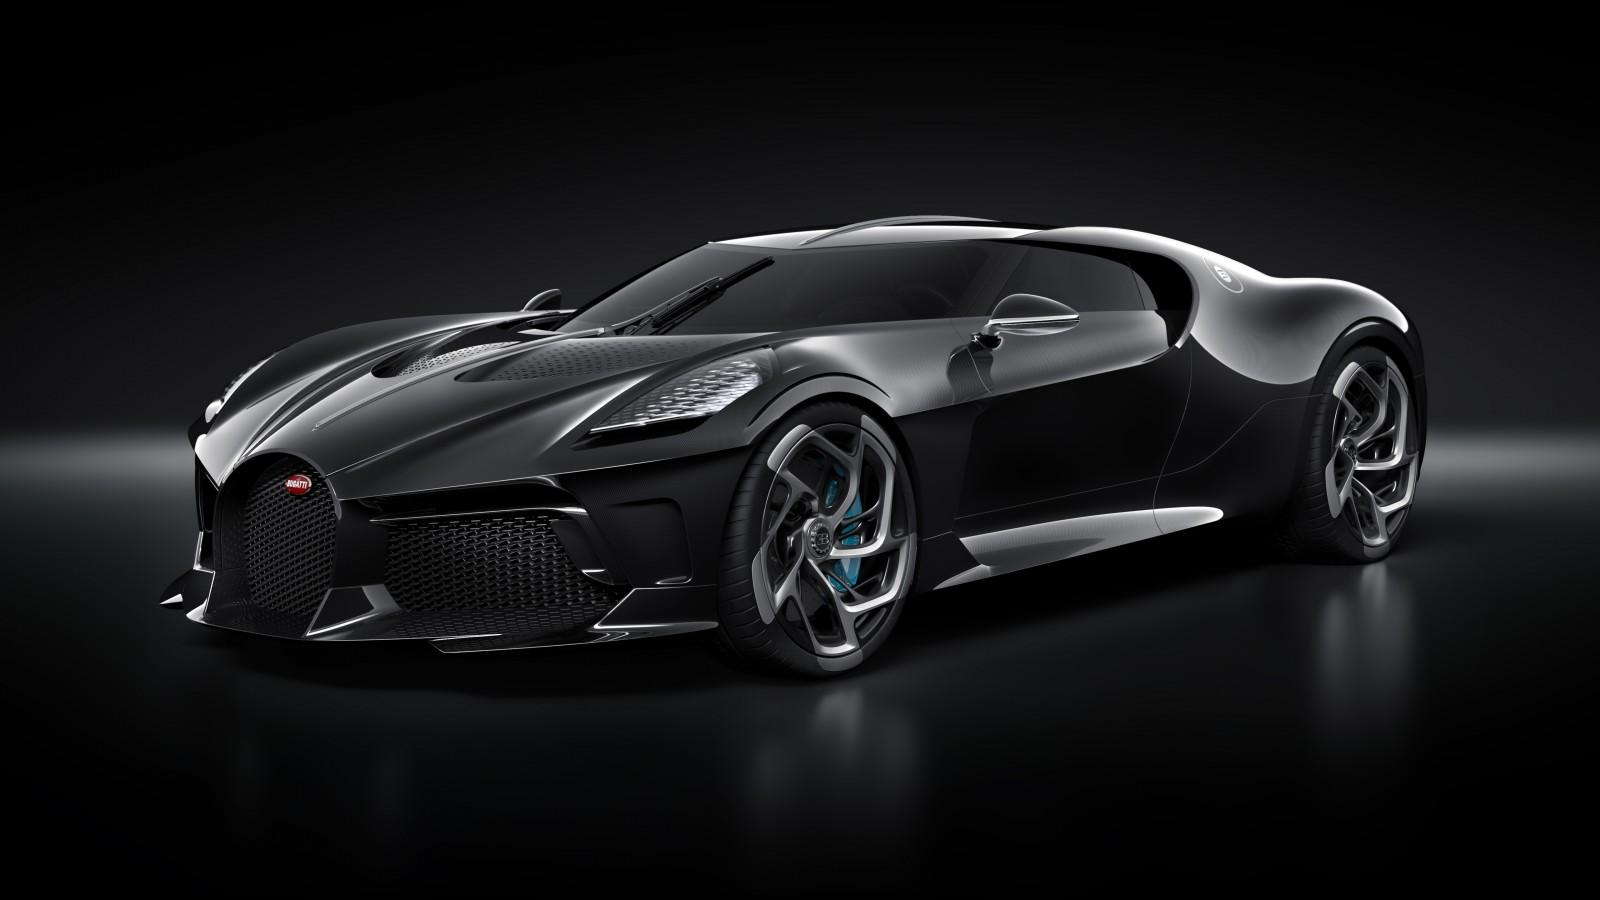 4k Uhd Wallpapers Of Cars Bugatti La Voiture Noire 2019 Geneva Motor Show 5k